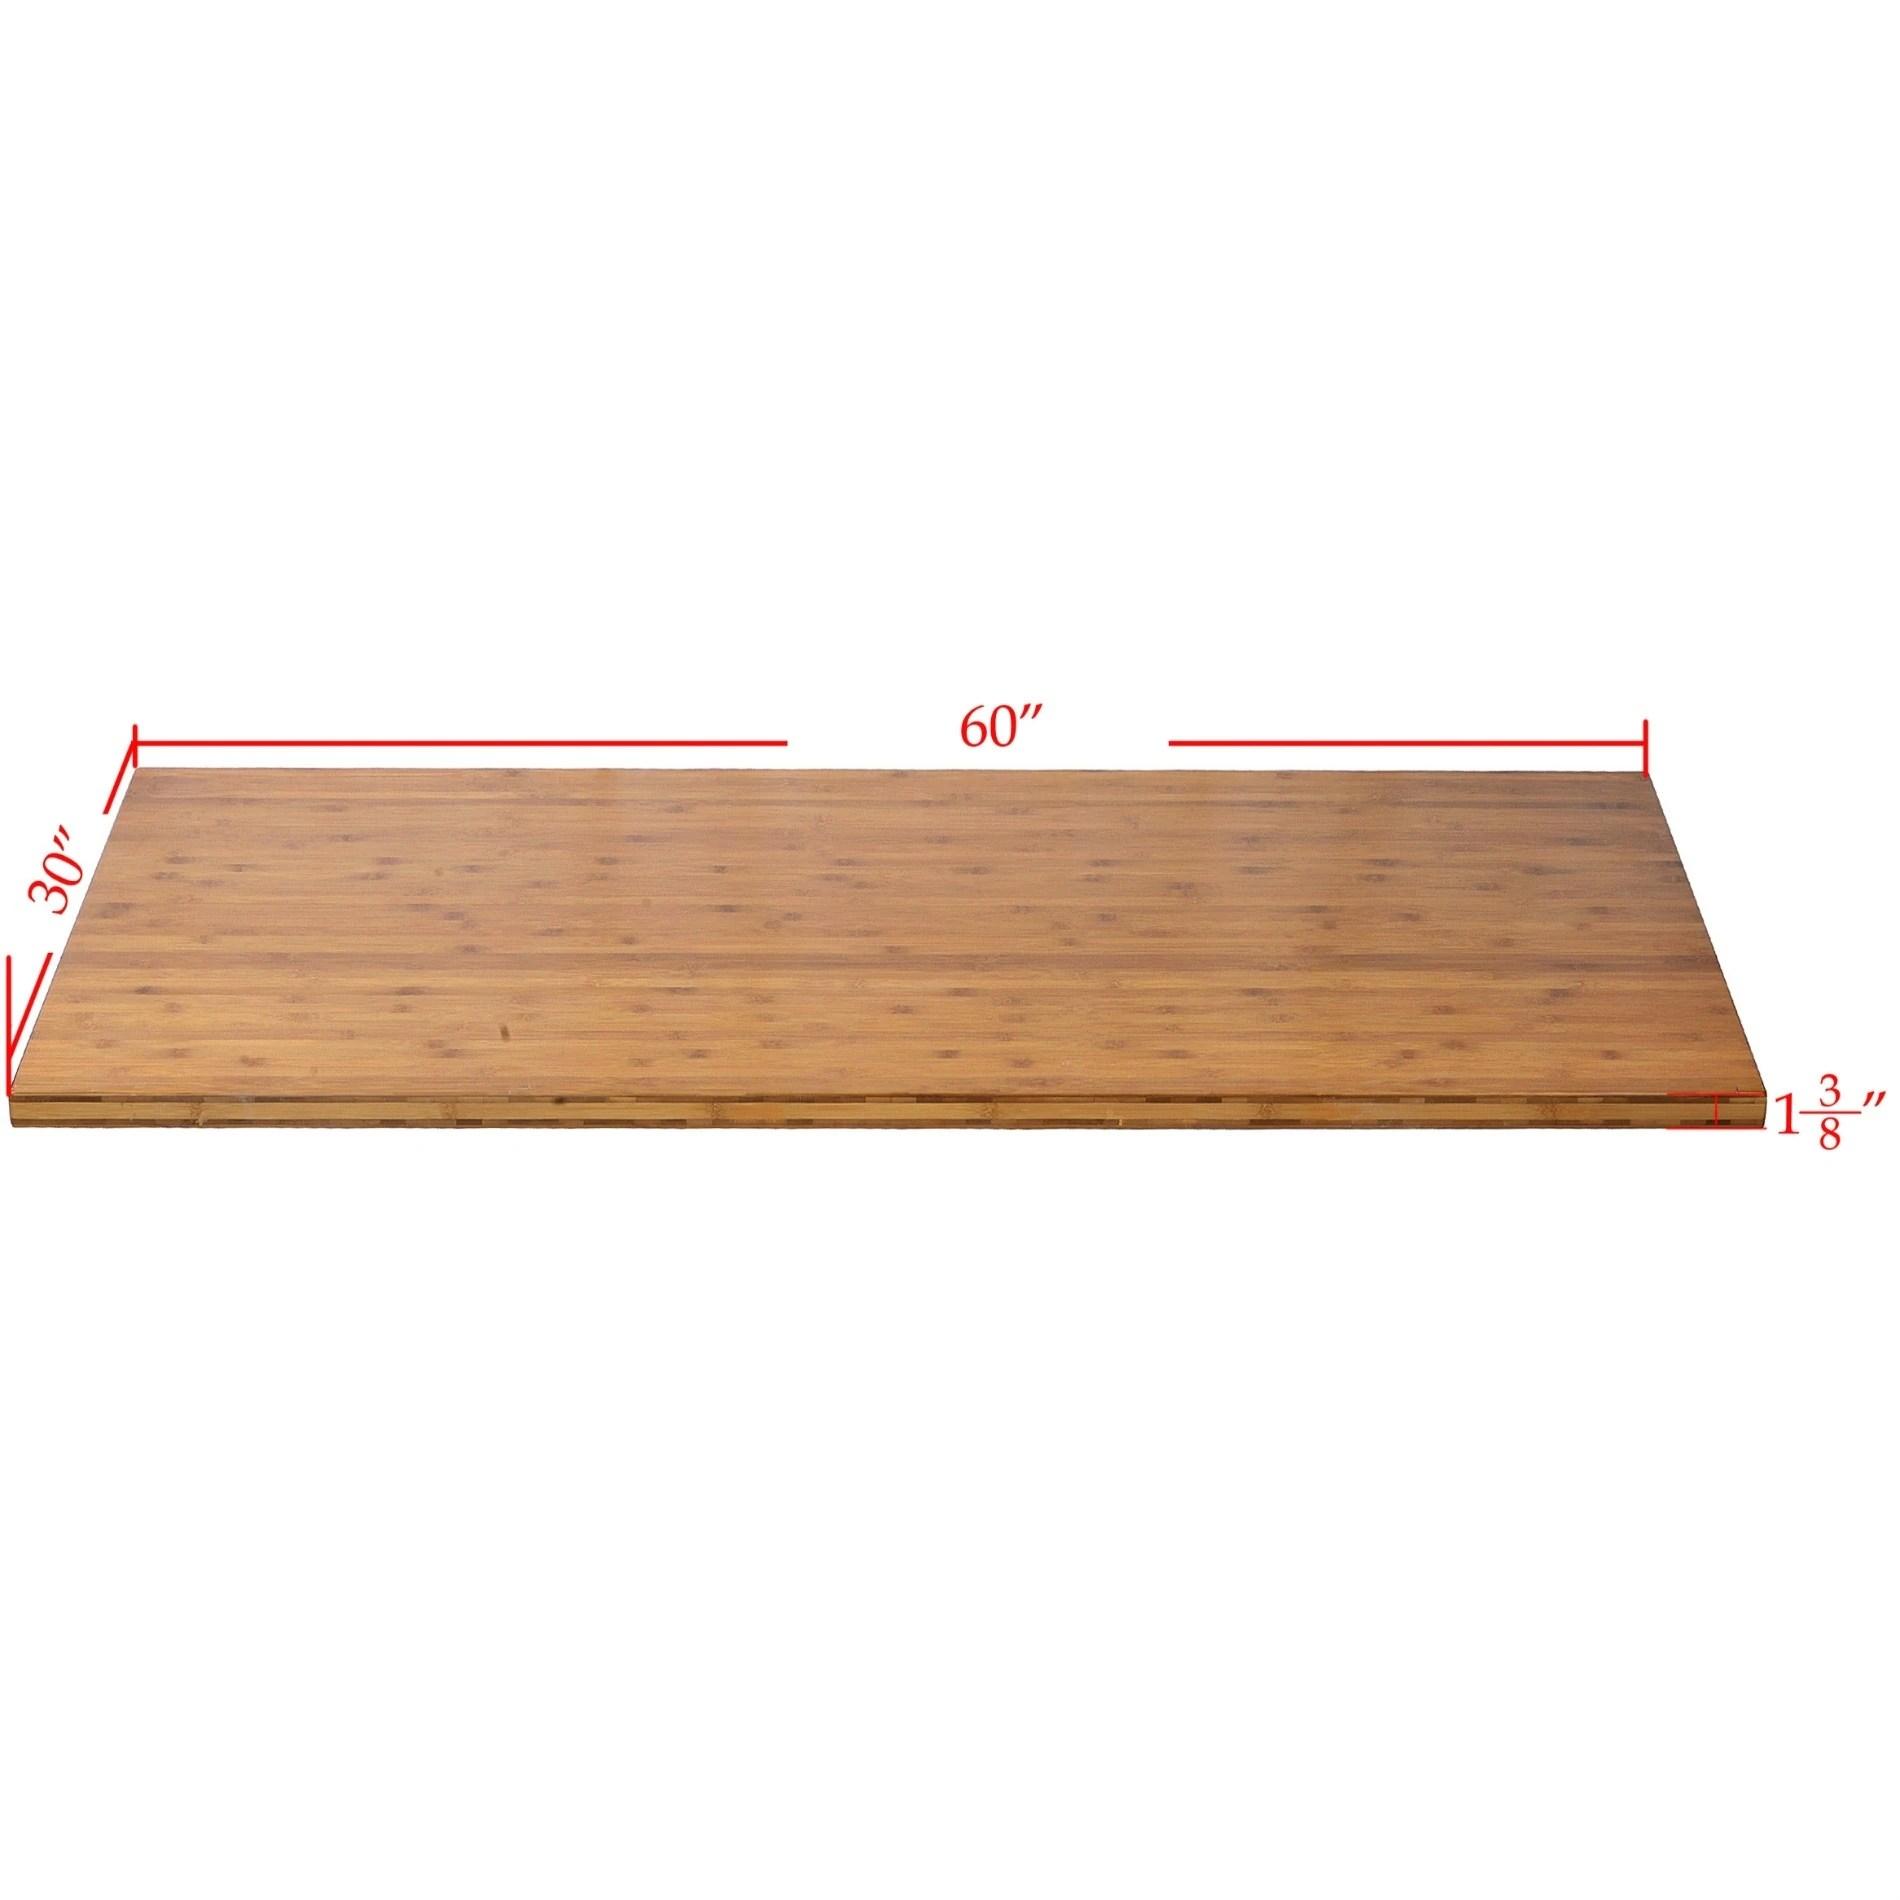 Hardwood Plywood Table Top